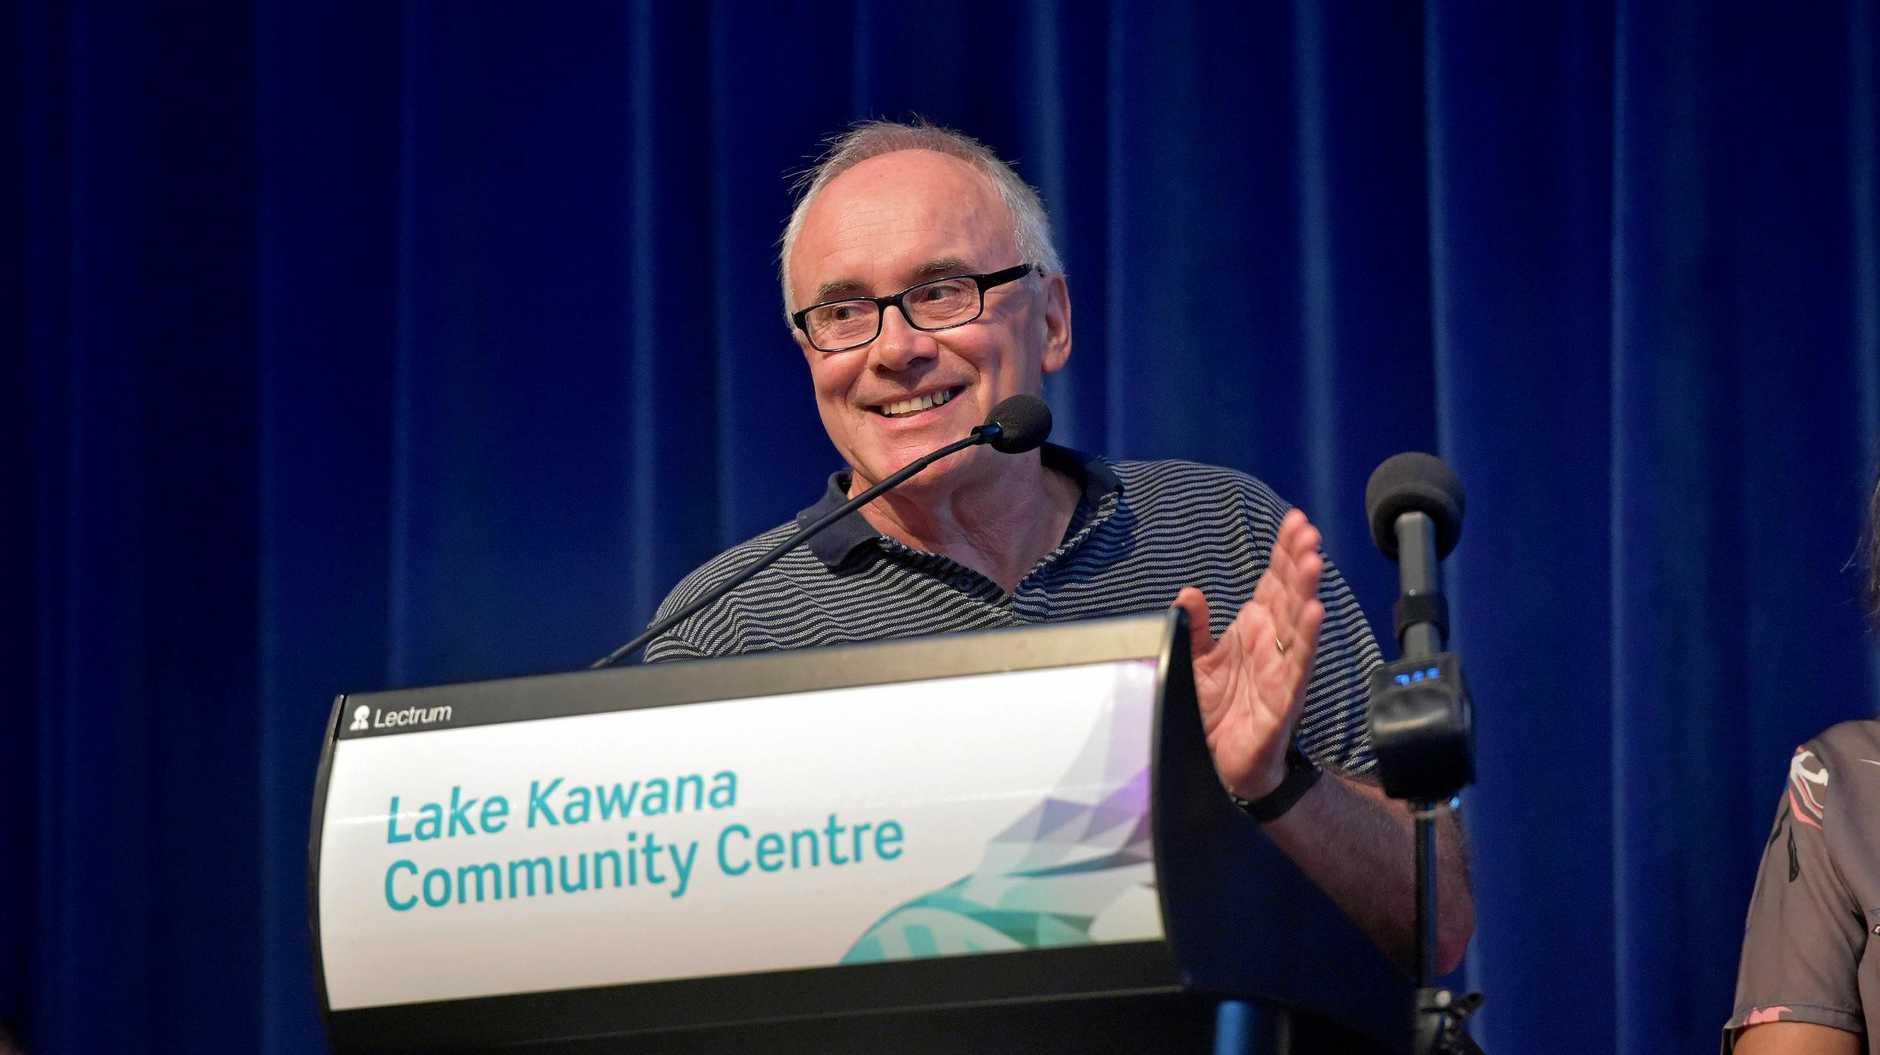 Sunshine Coast Community Parking Workshop held at the Lake Kawana Community Centre. Greg Smith raises concerns in his area.